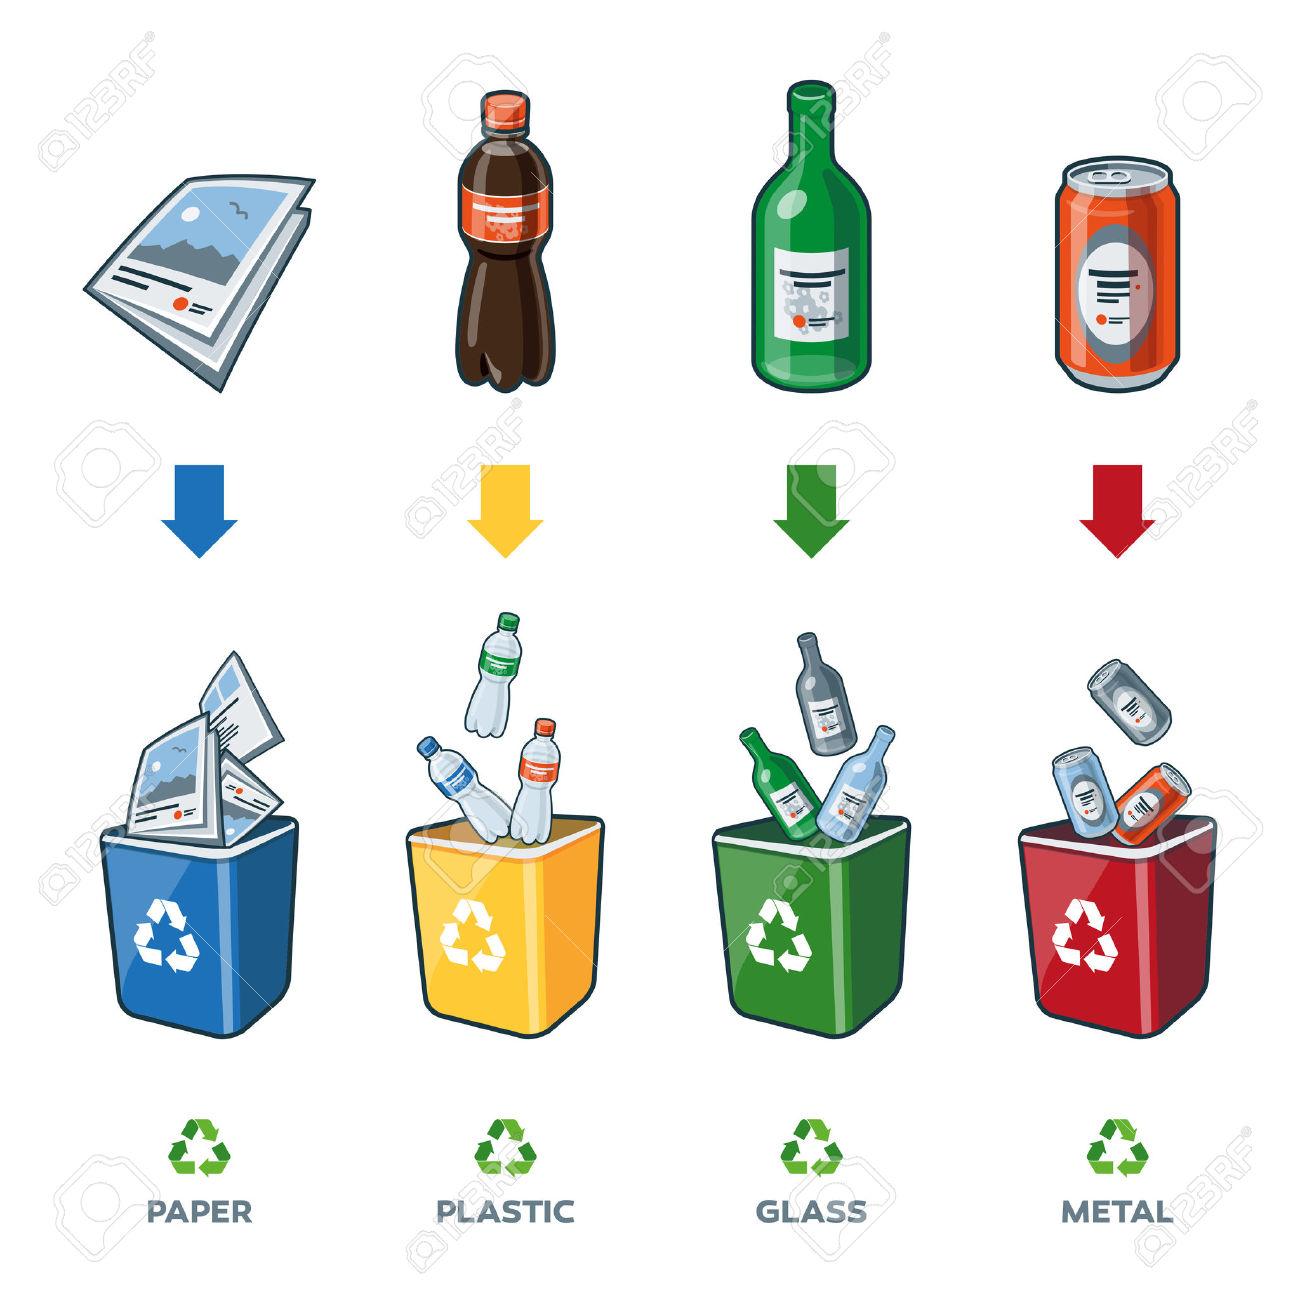 1300x1300 Plastic Clipart Recycle Bin